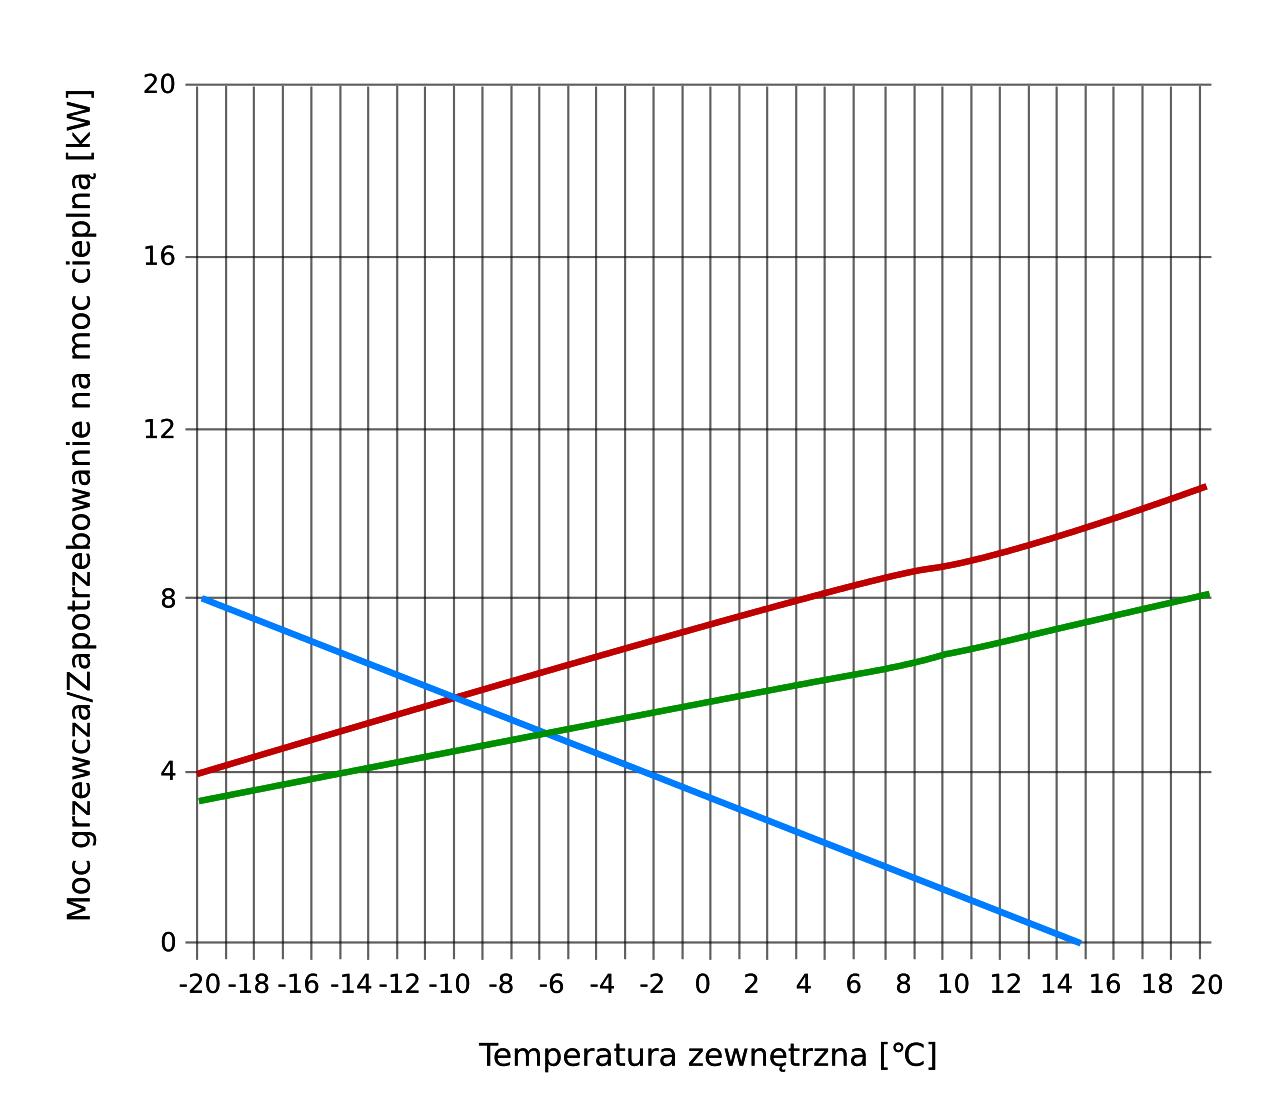 wykres powietrzny wykres powietrzny - wykres powietrzny 1